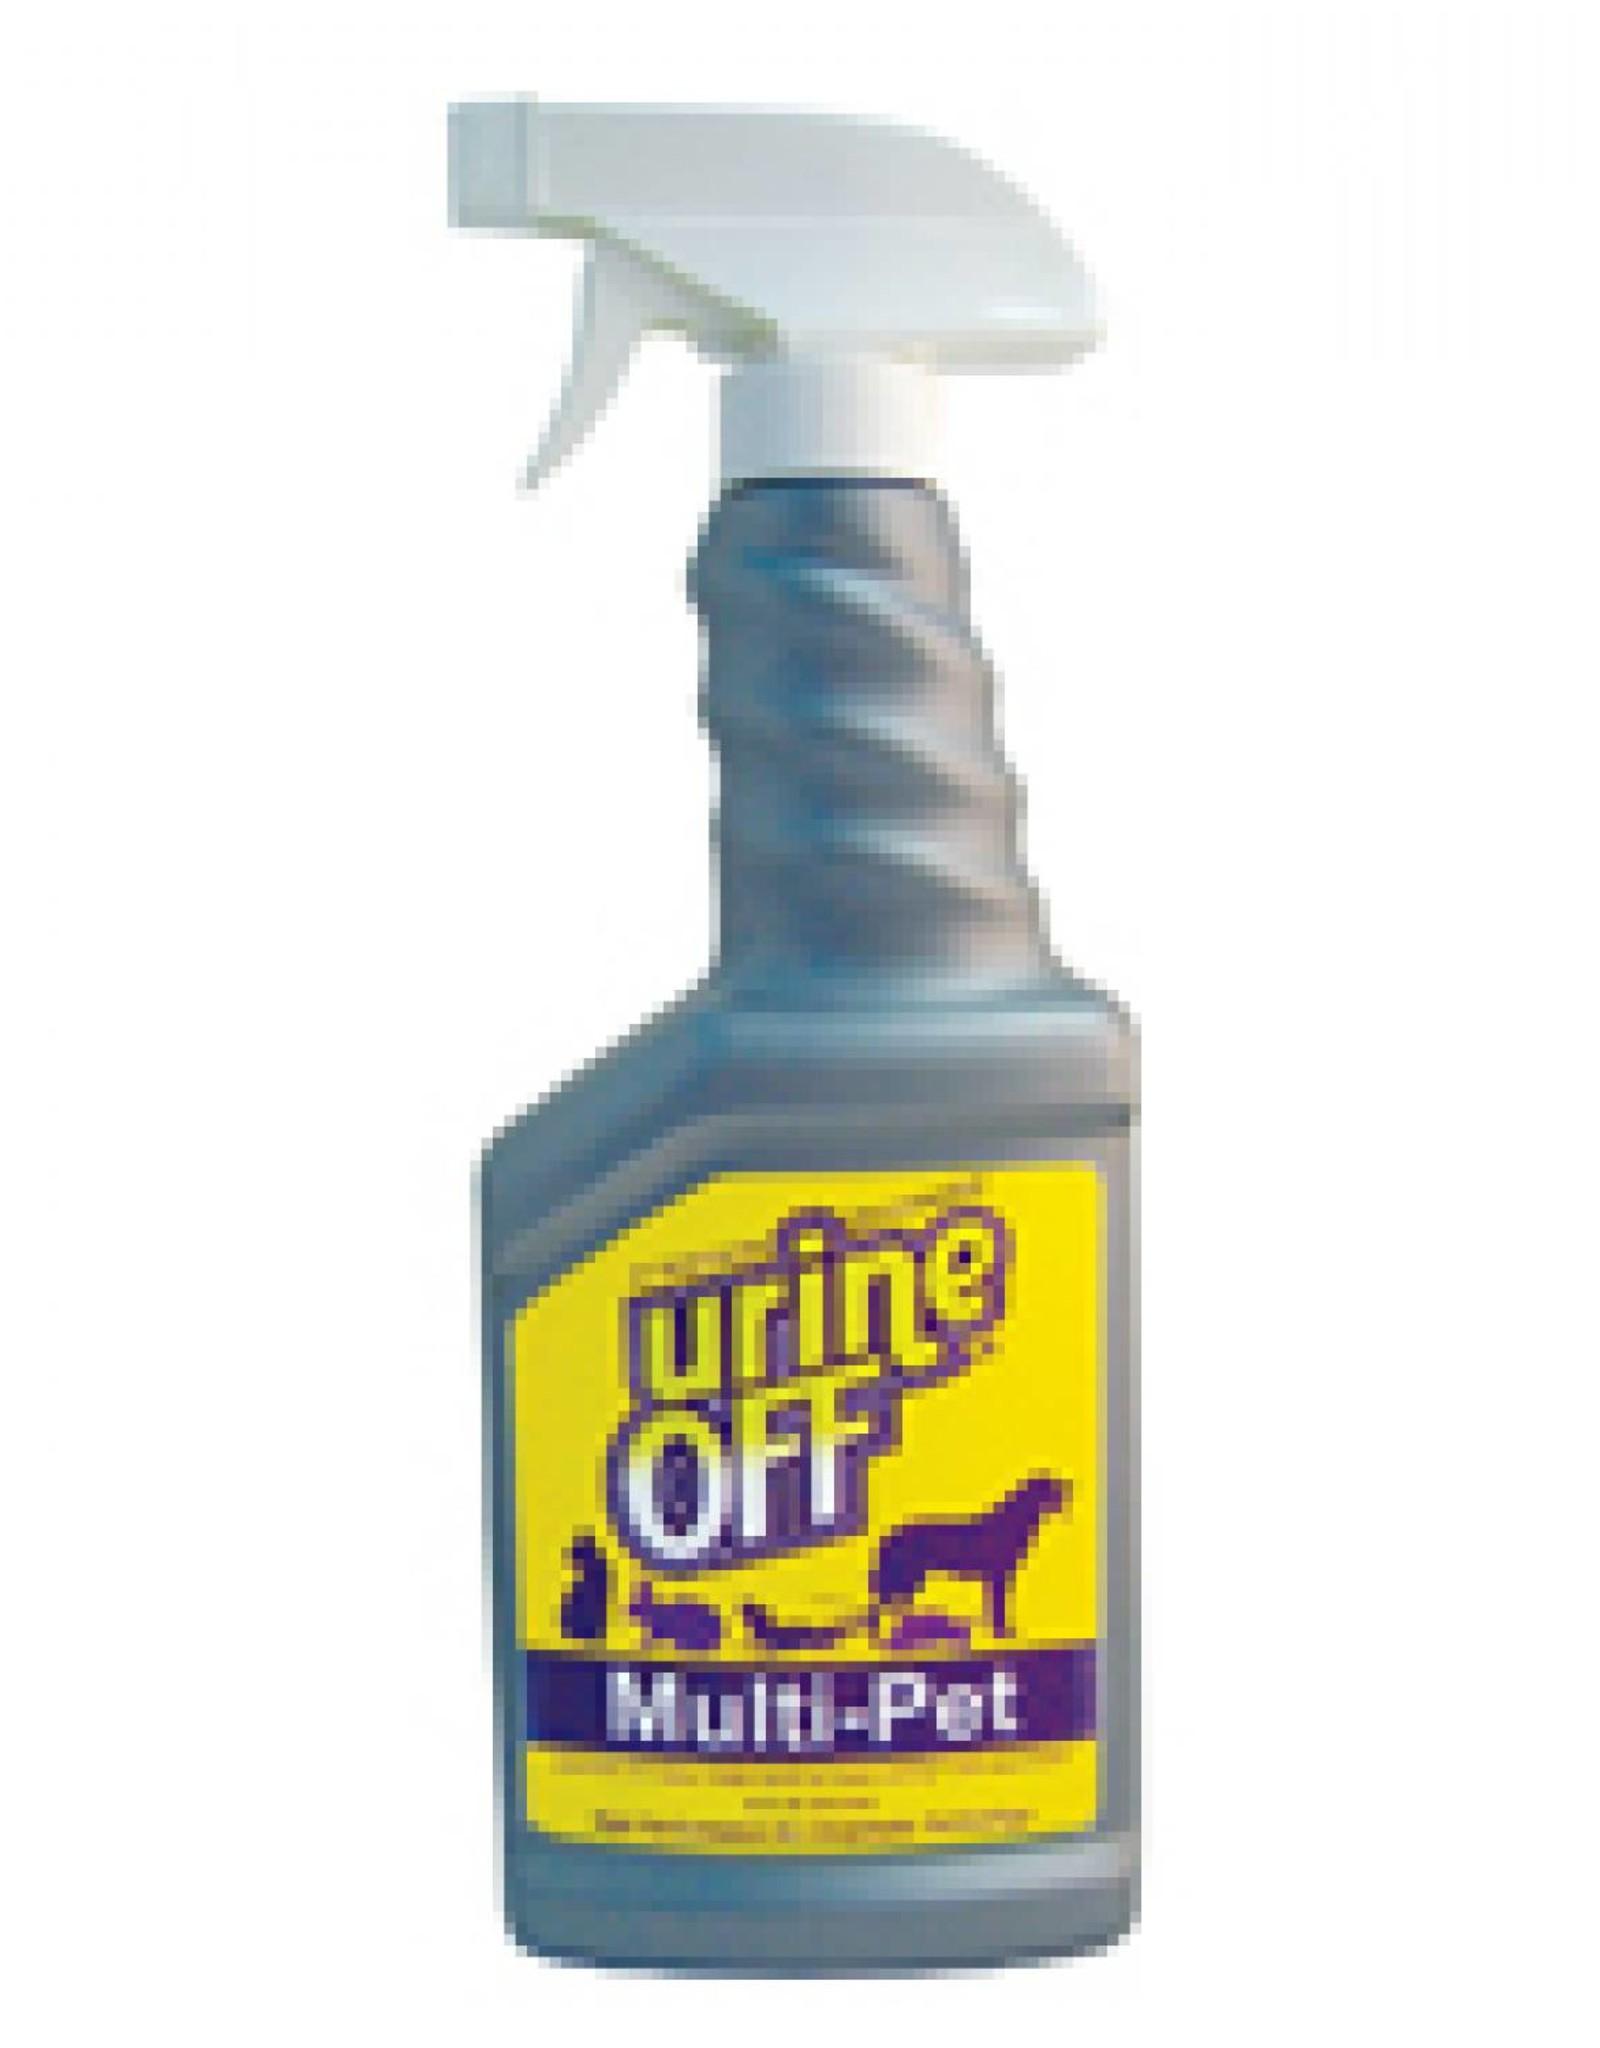 UrineOff Multi-Purpose Reiniger karaf Sprayflacon. Doos: 12 x 1 Liter.